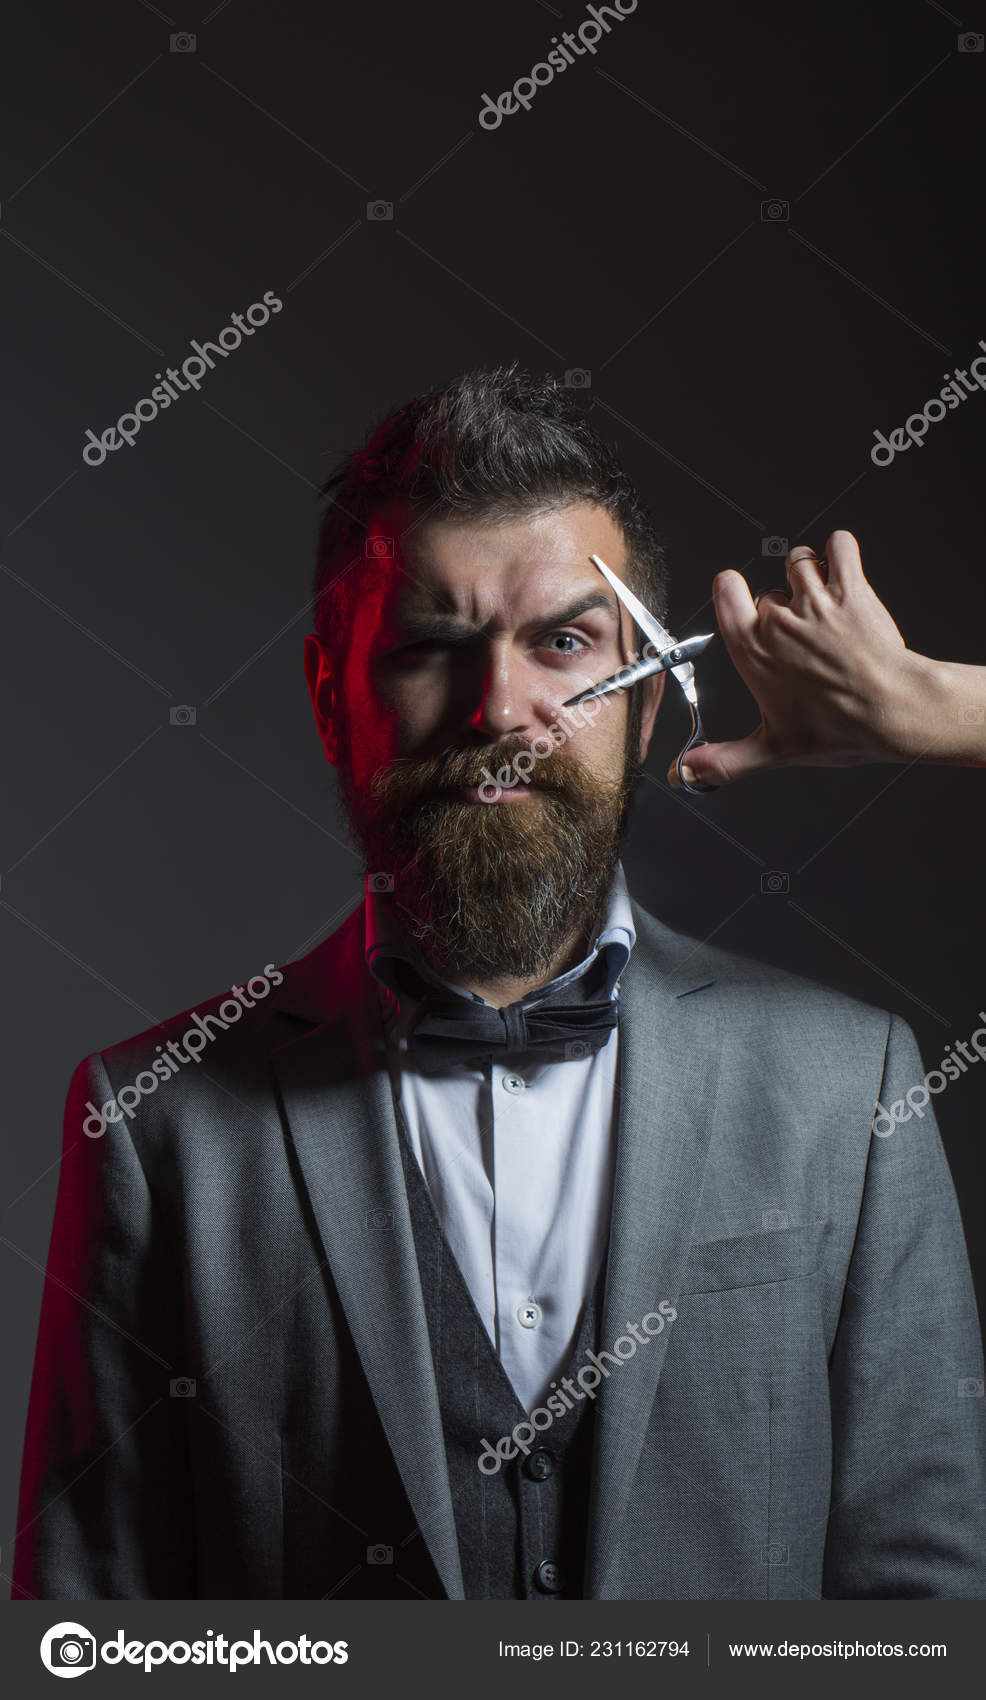 Barber Scissors Mens Haircut Bearded Man Long Beard Brutal Caucasian Hipster With Moustache Haircut Handsome Bearded Barbershop Sexy Men Macho Long Beard Vintage Barbershop Shavin Stock Photo Image By C Bodystock69 Gmail Com